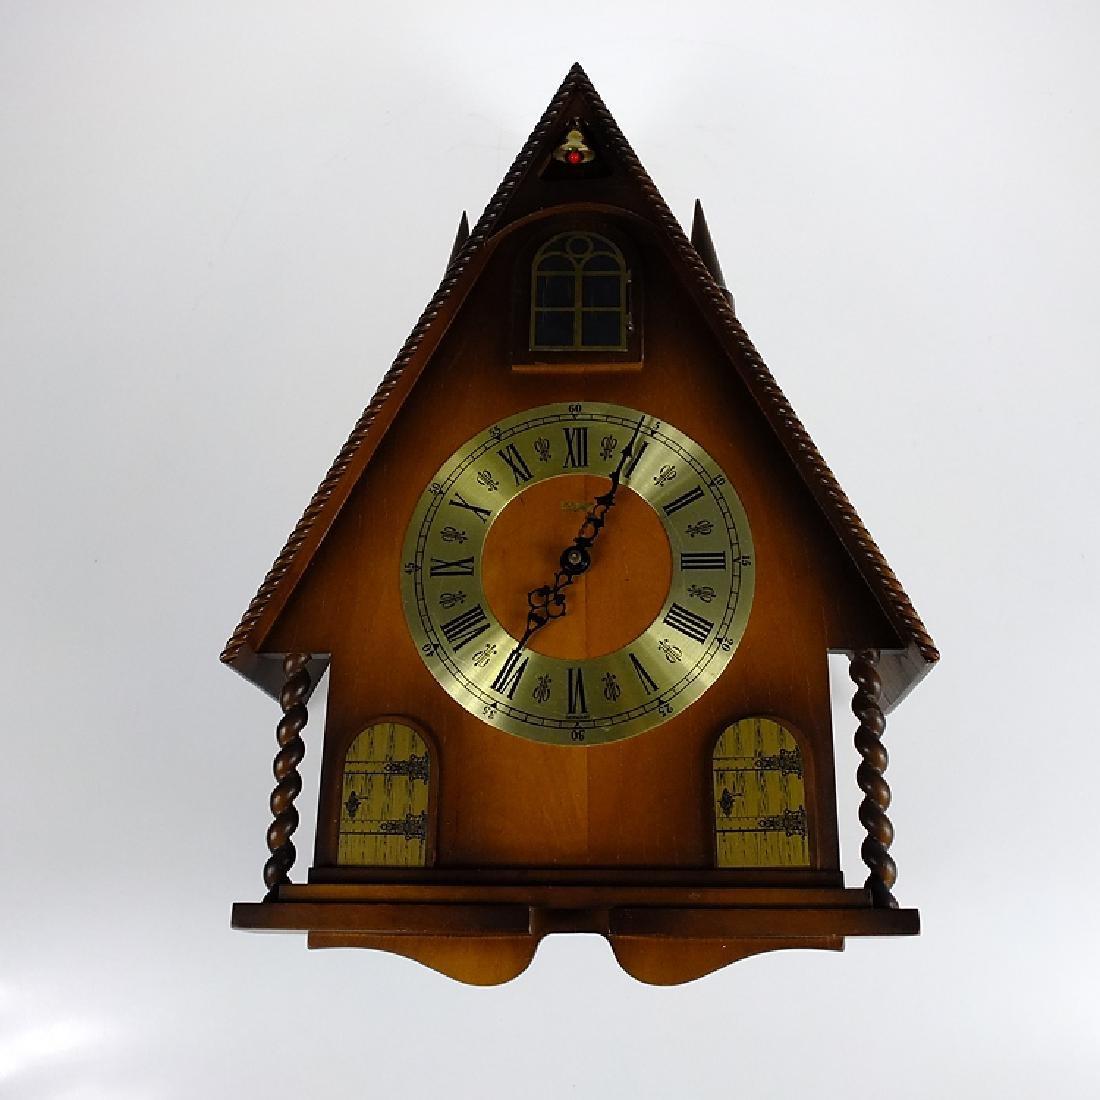 Cuckoo Clock Mfg Co LINDEN 8-DAY CLOCK BLACK FOREST